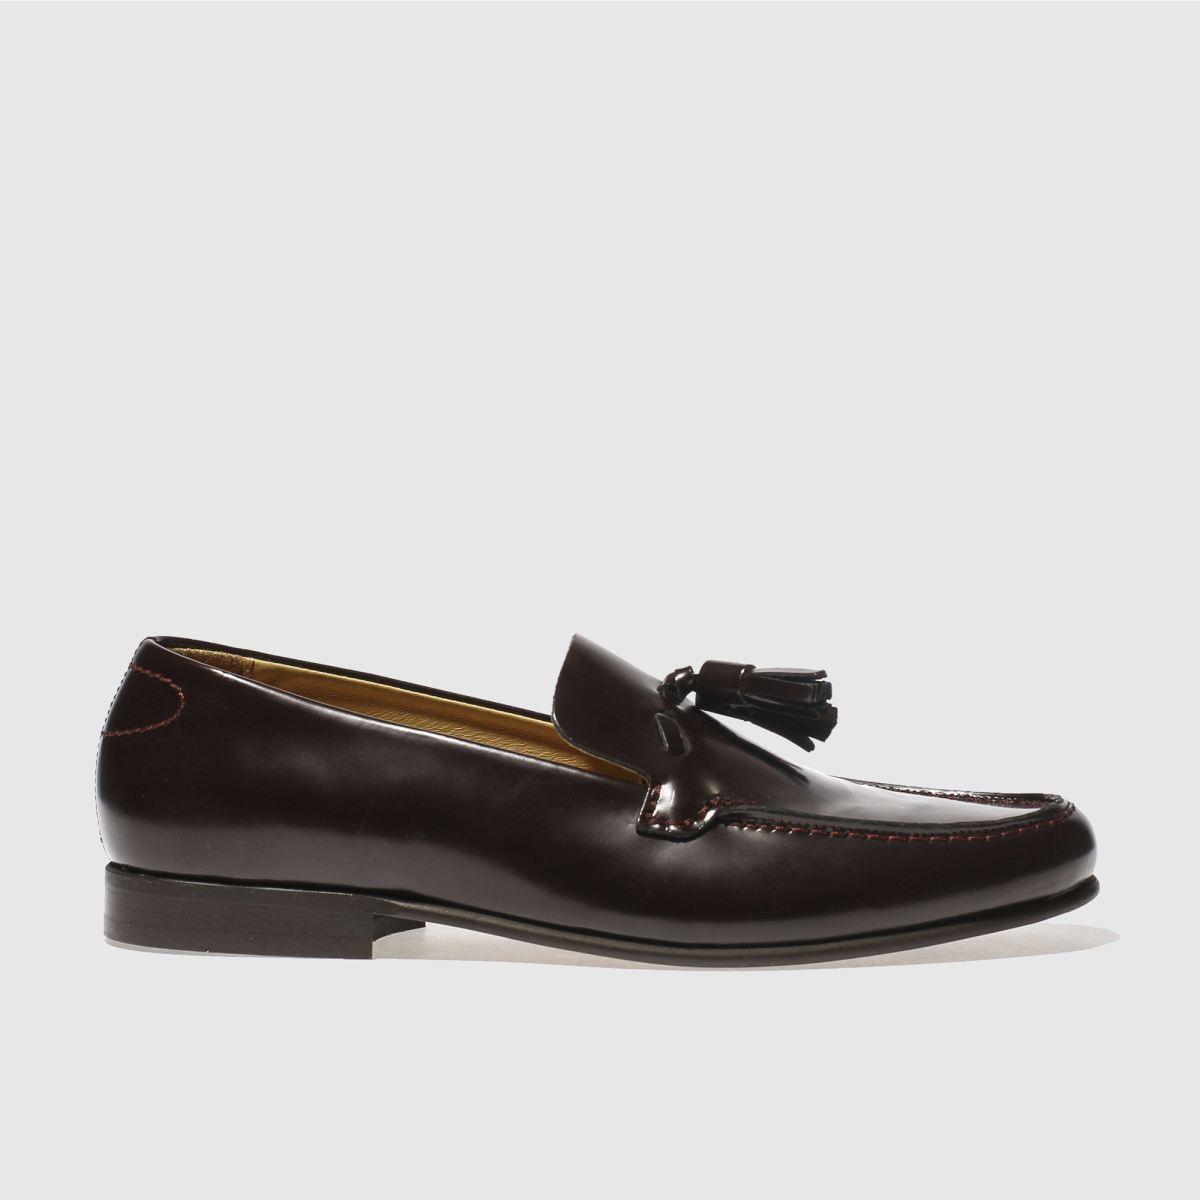 h by hudson burgundy bernini shoes